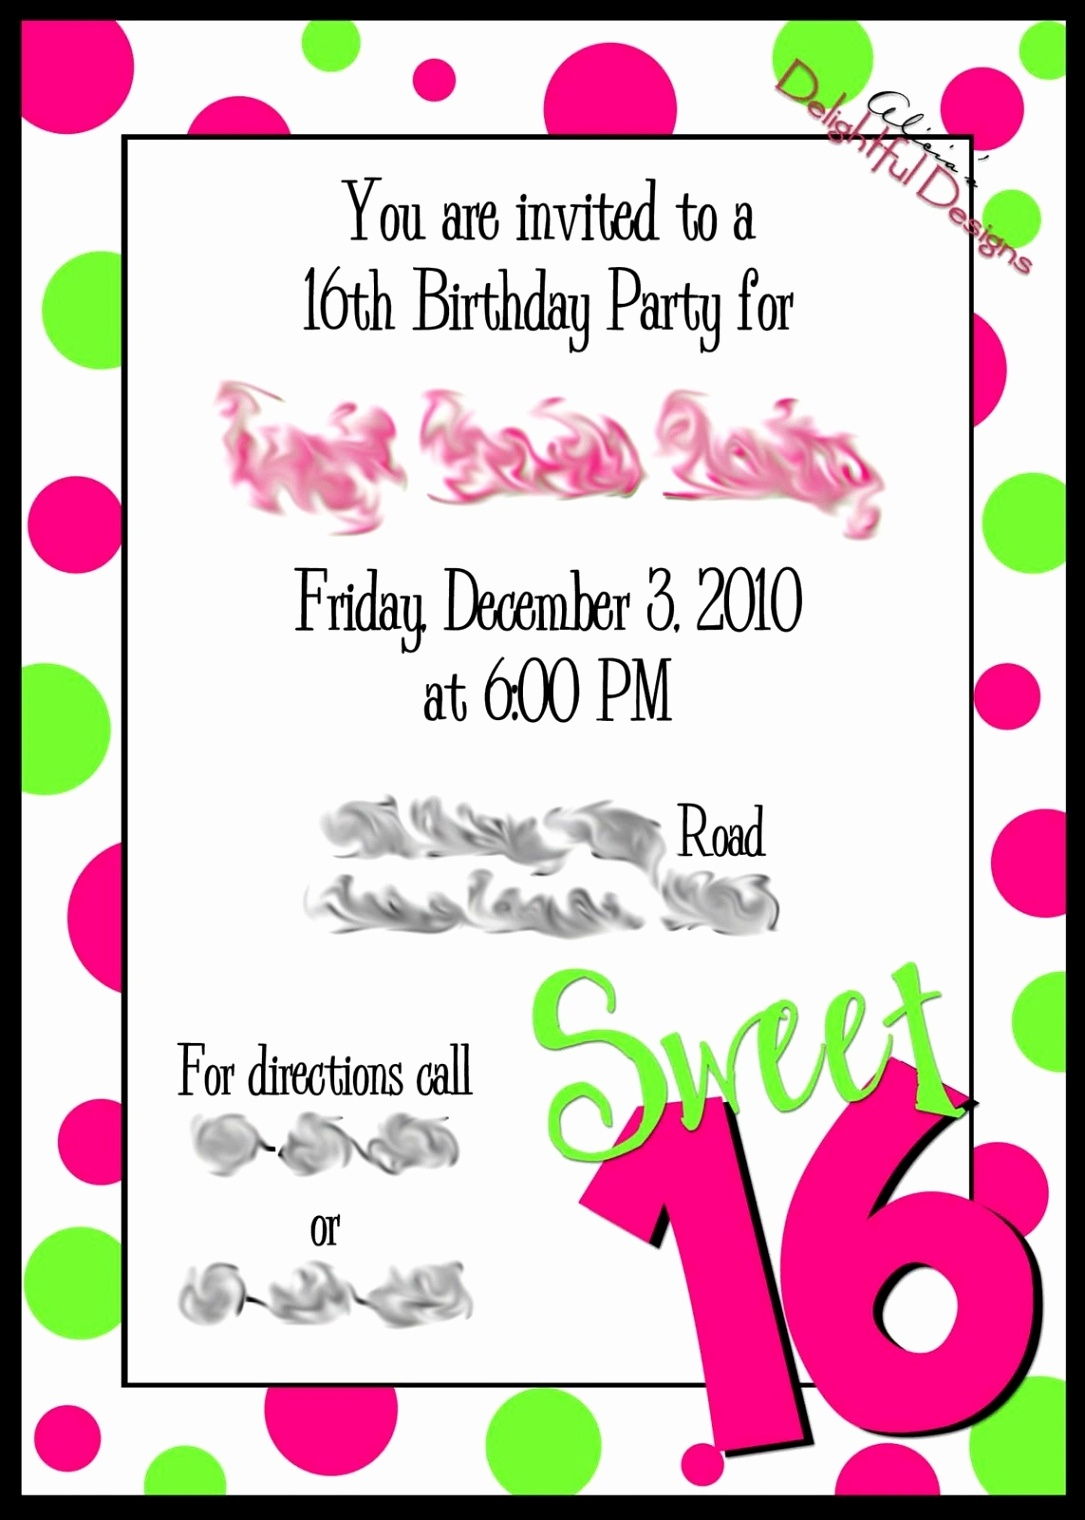 97+ Printable 16Th Birthday Invitations - Sweet 16 Invitation - Free Printable 16Th Birthday Party Invitation Templates